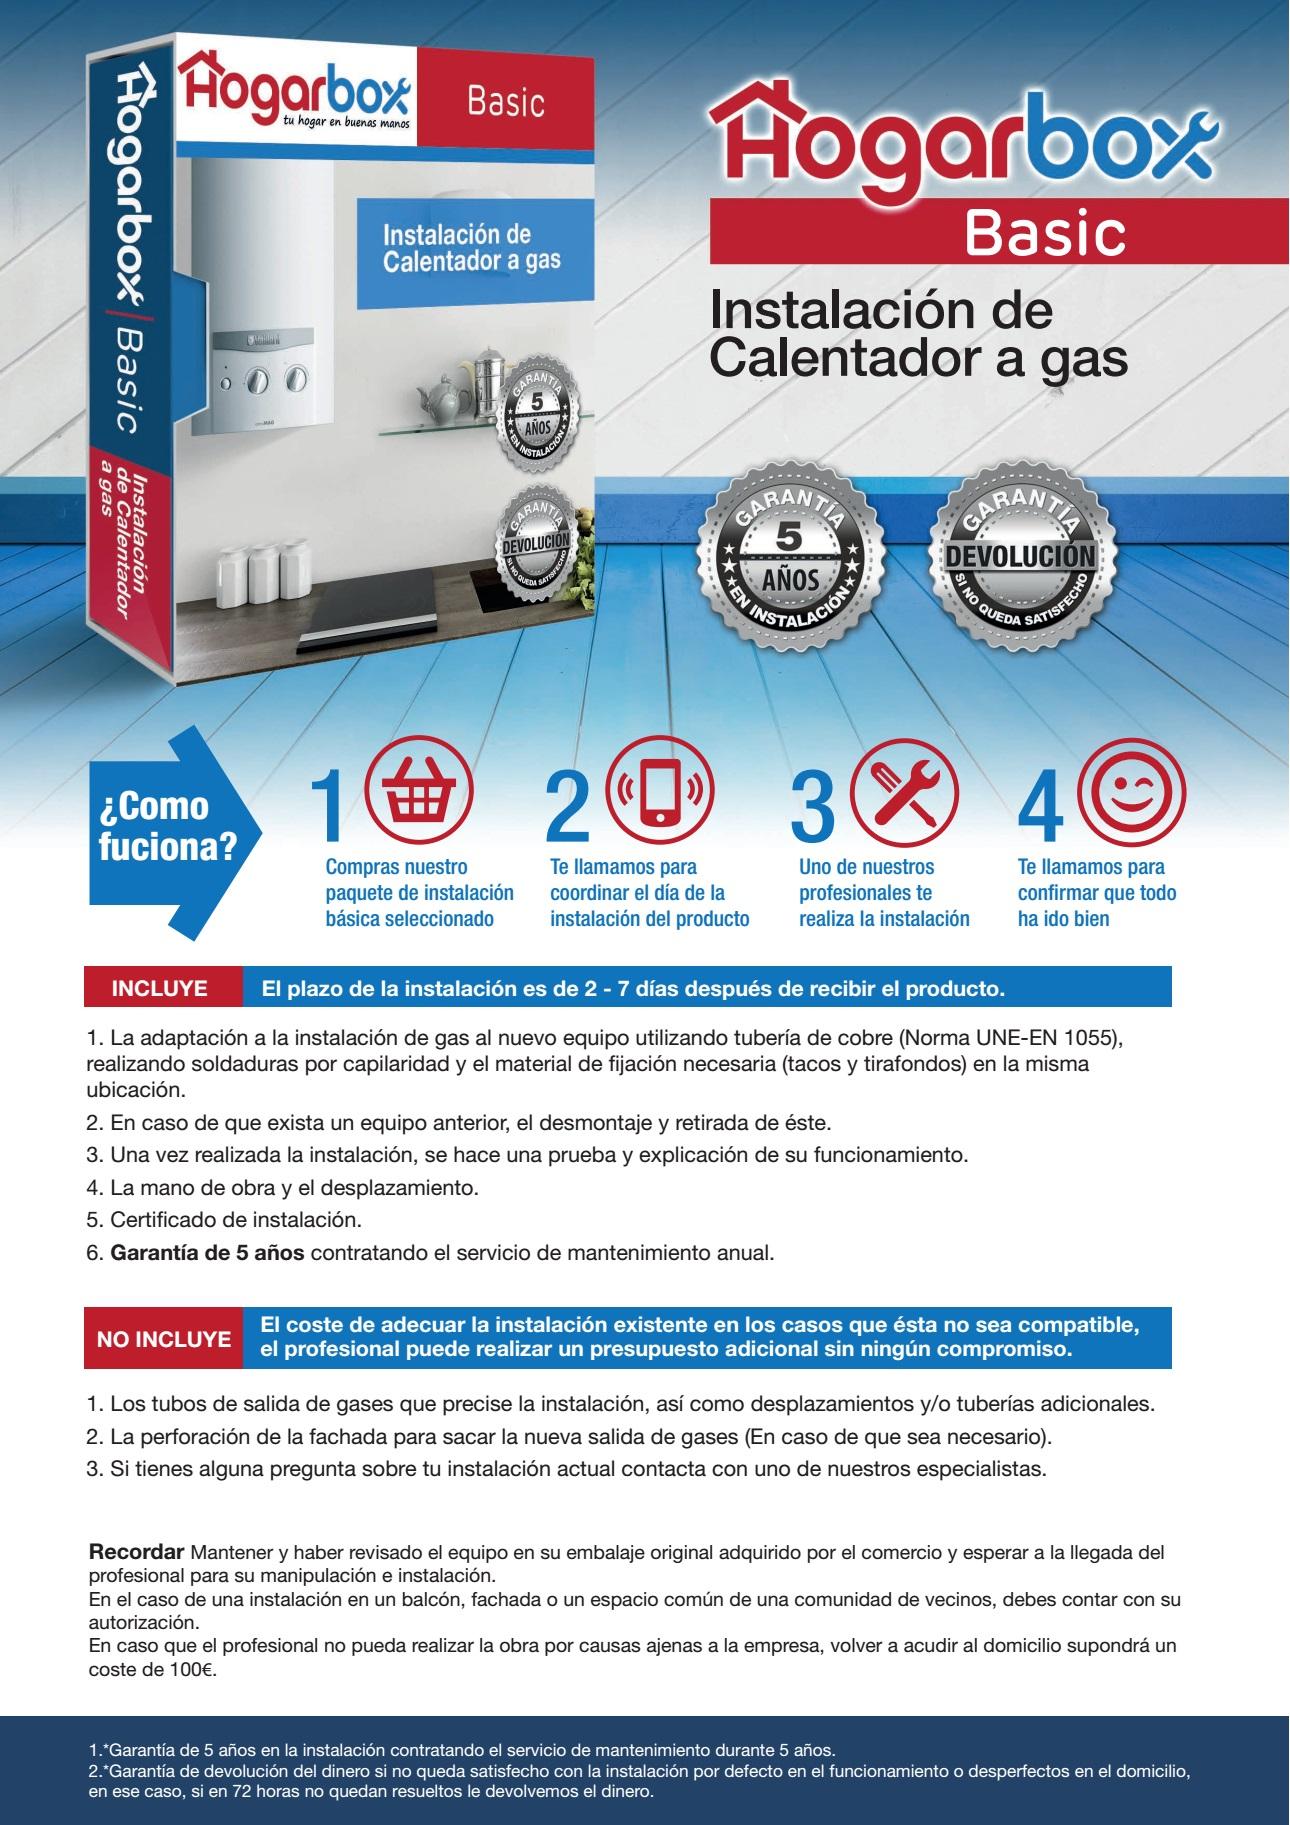 Hogarbox basic precio instalaci n calentador a gas for Instalacion calentador gas